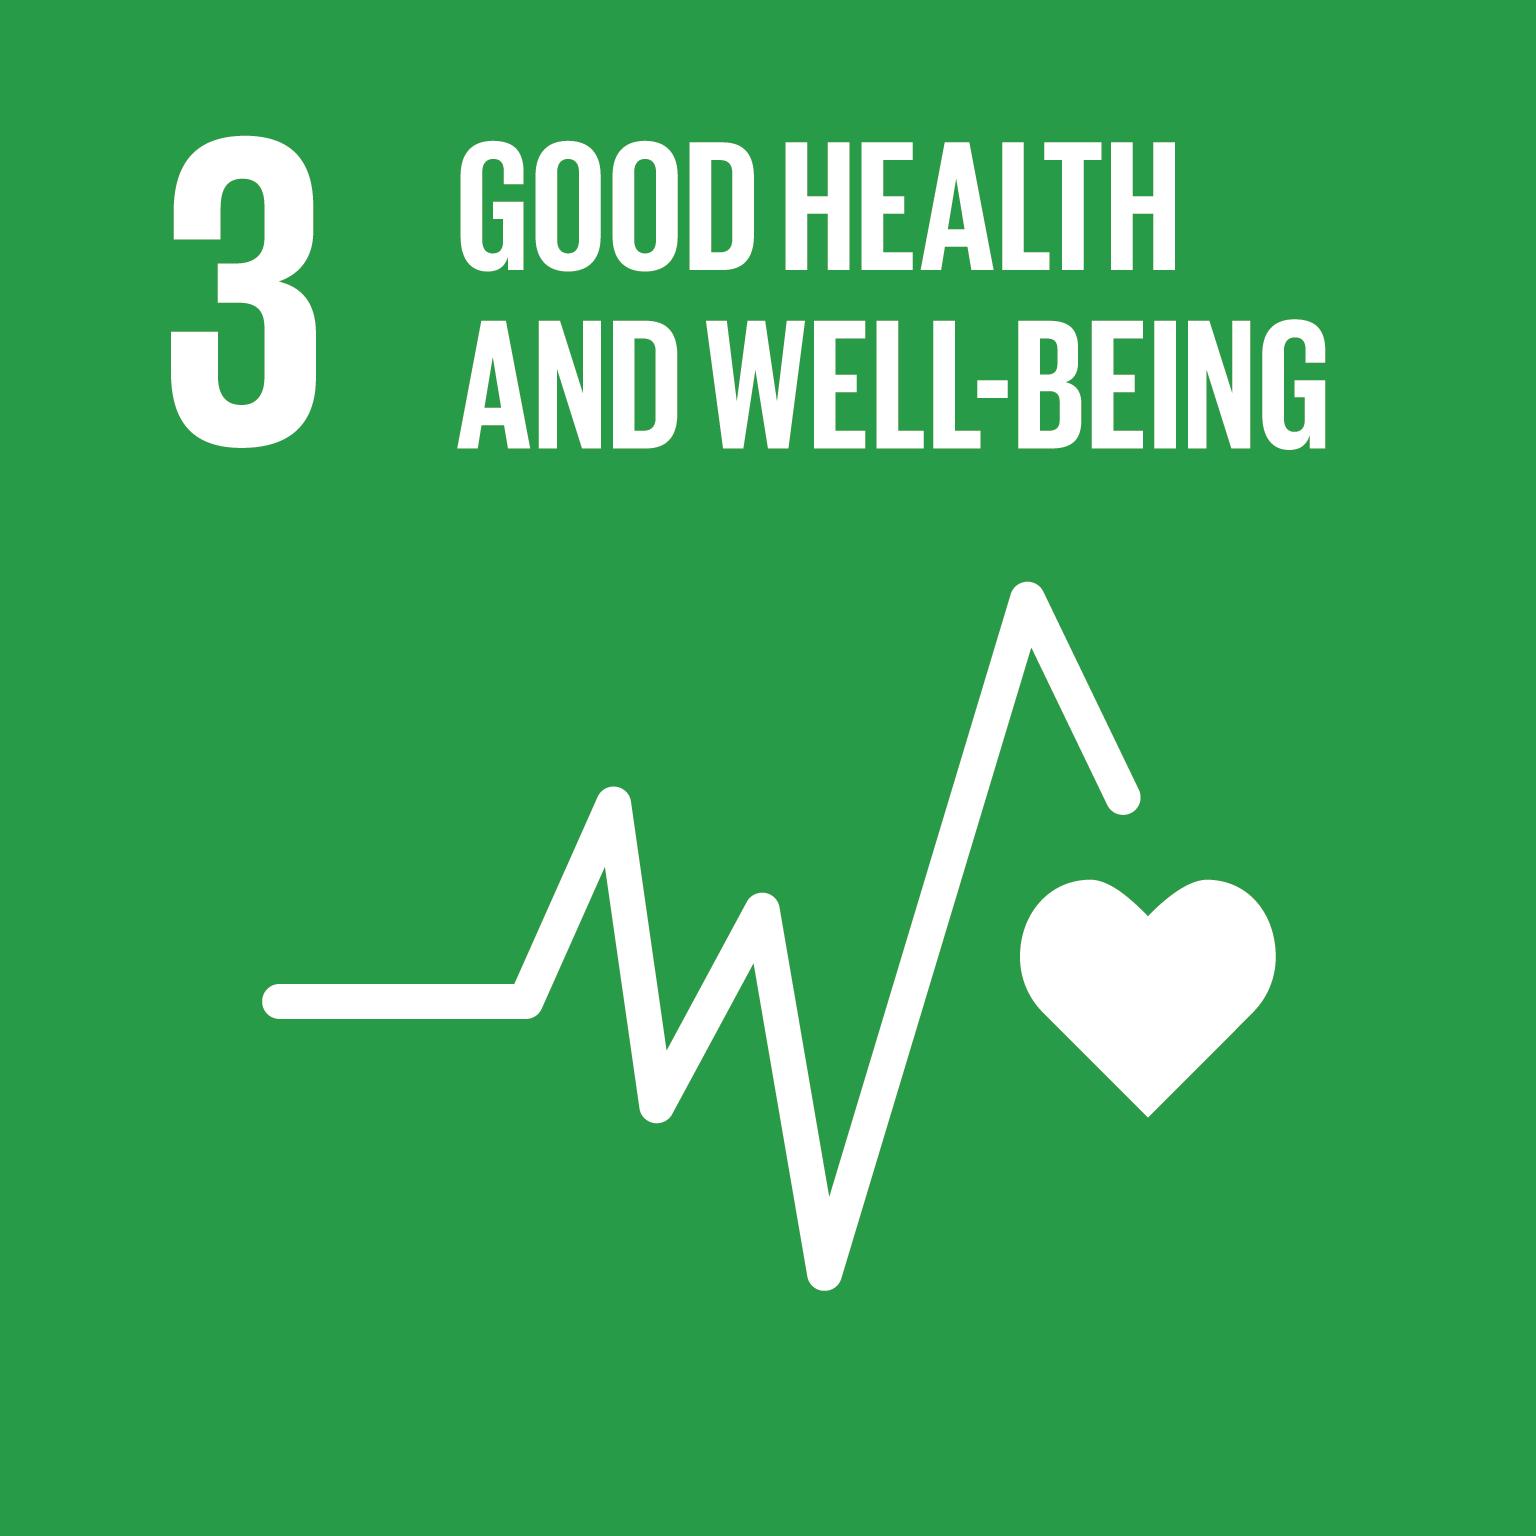 SDG Goal #3 Good Health